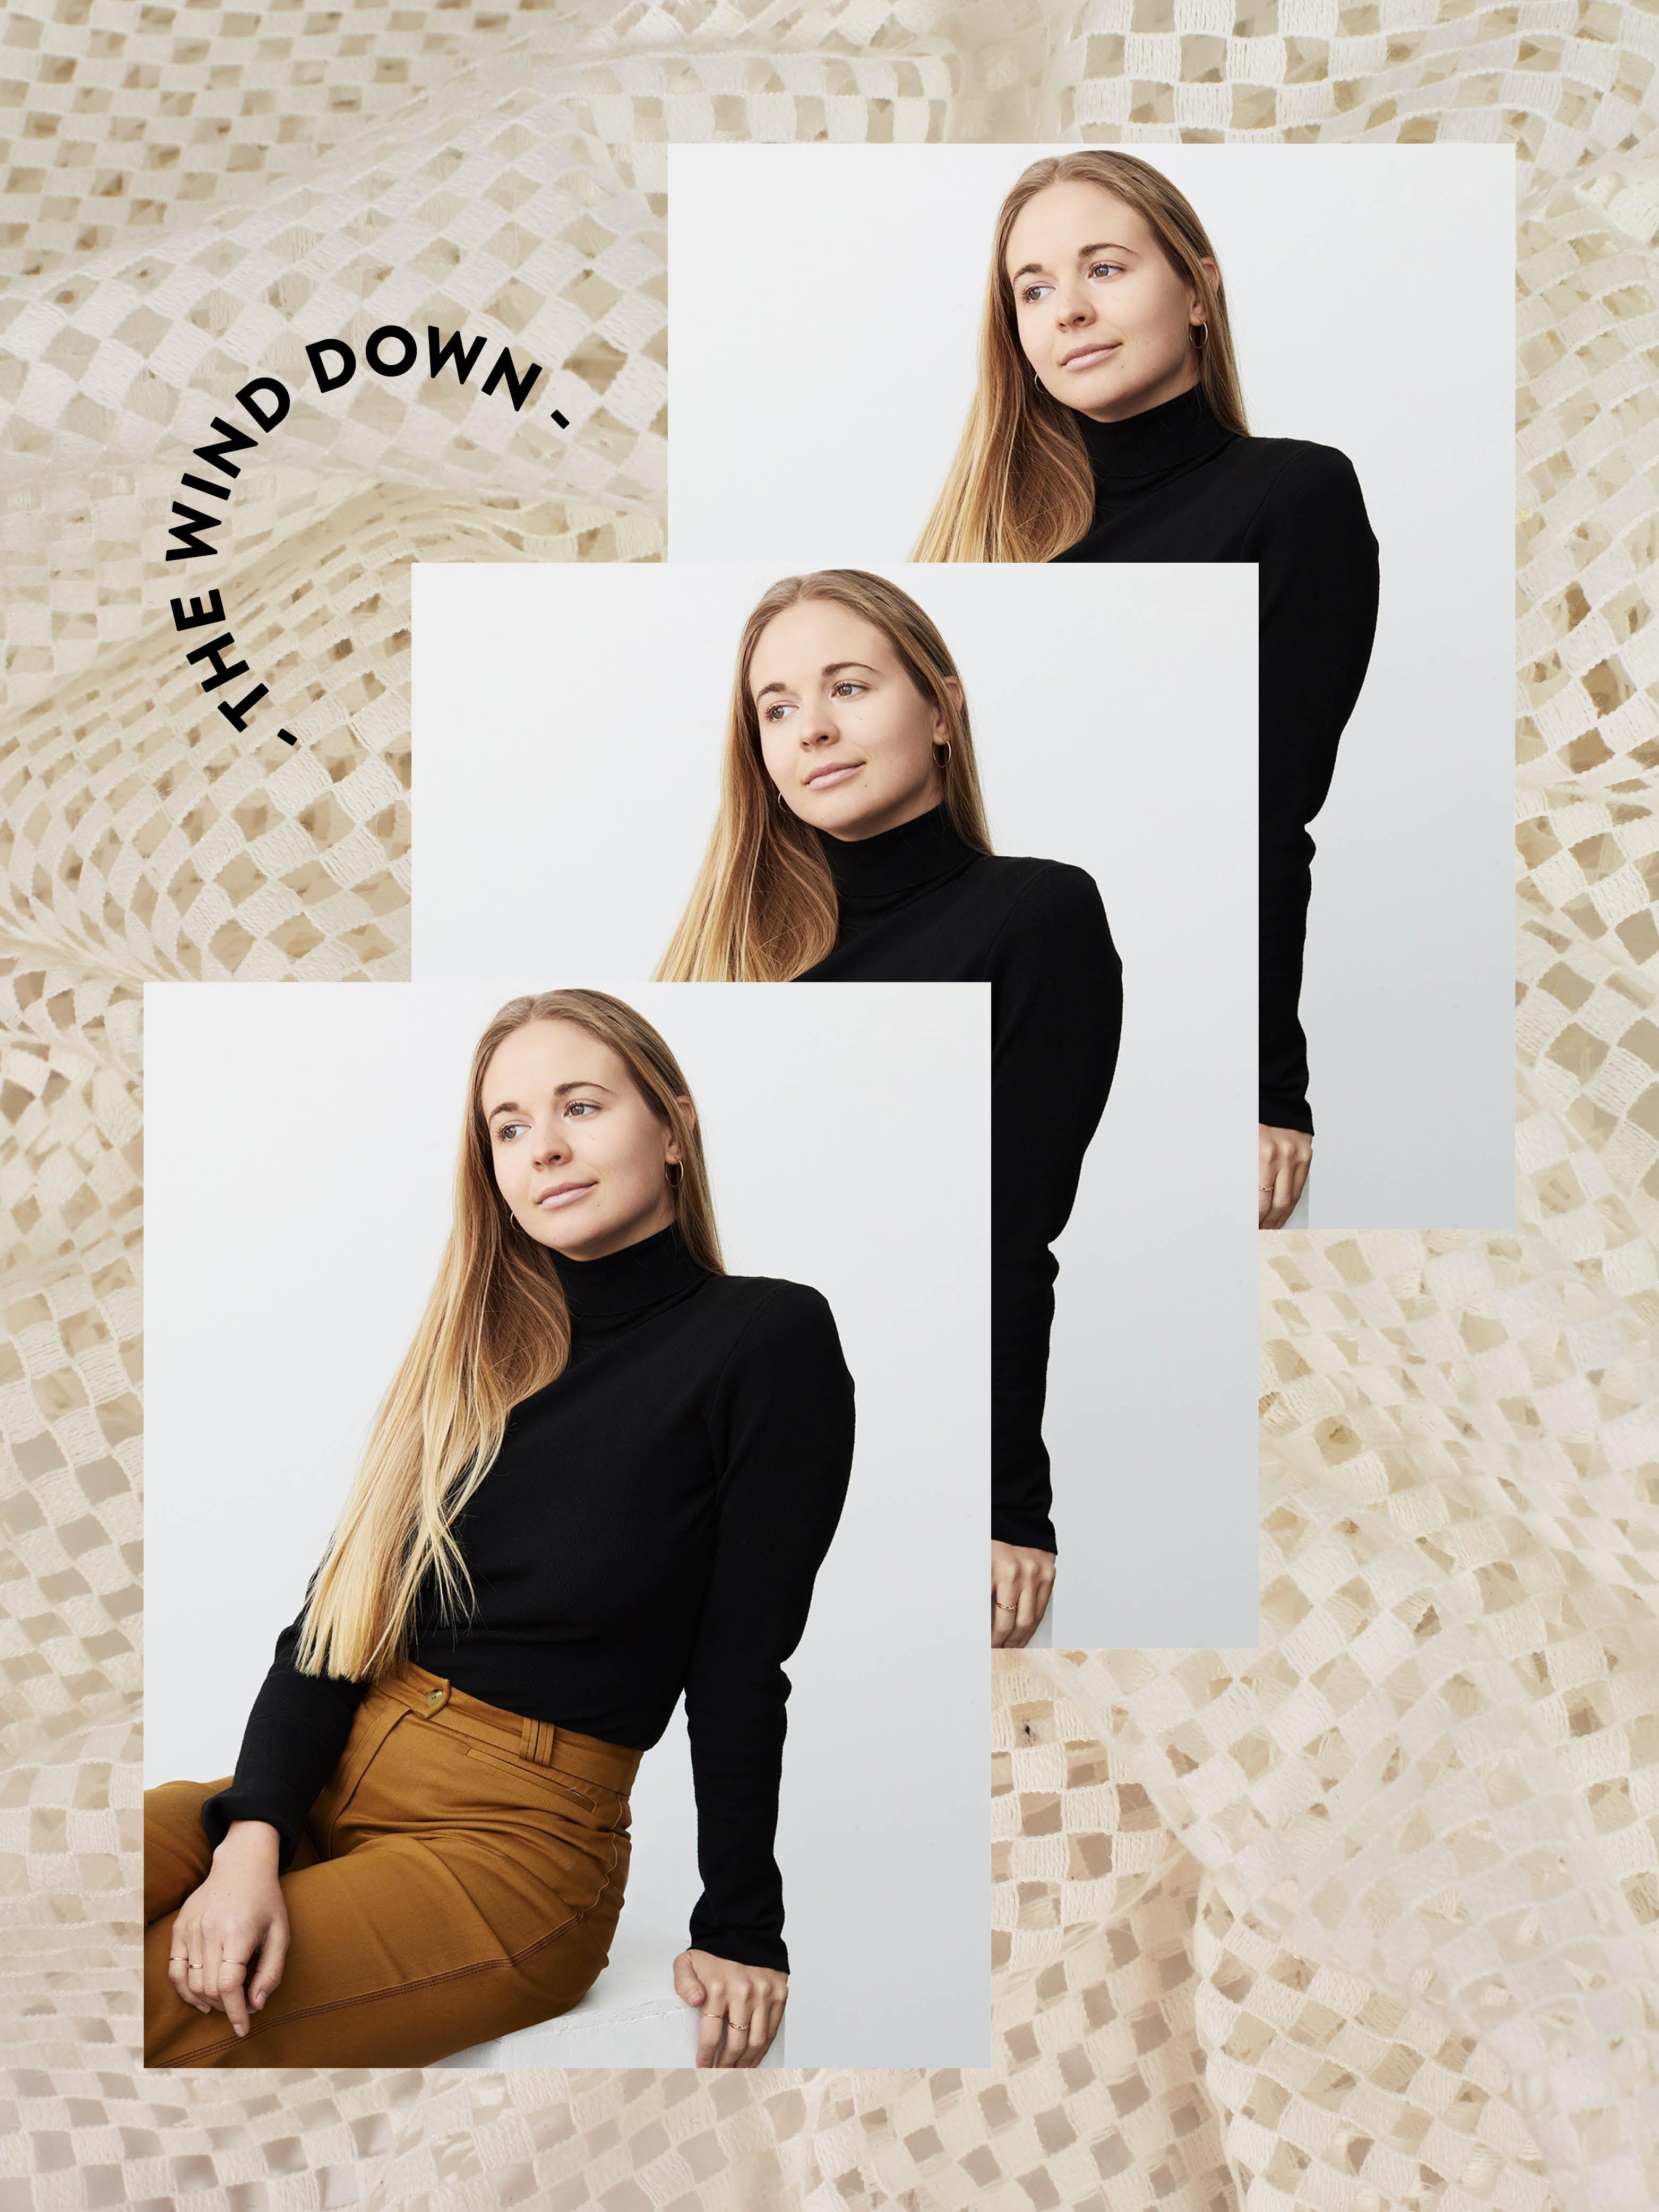 The_Wind_Down_Krissy_Jones